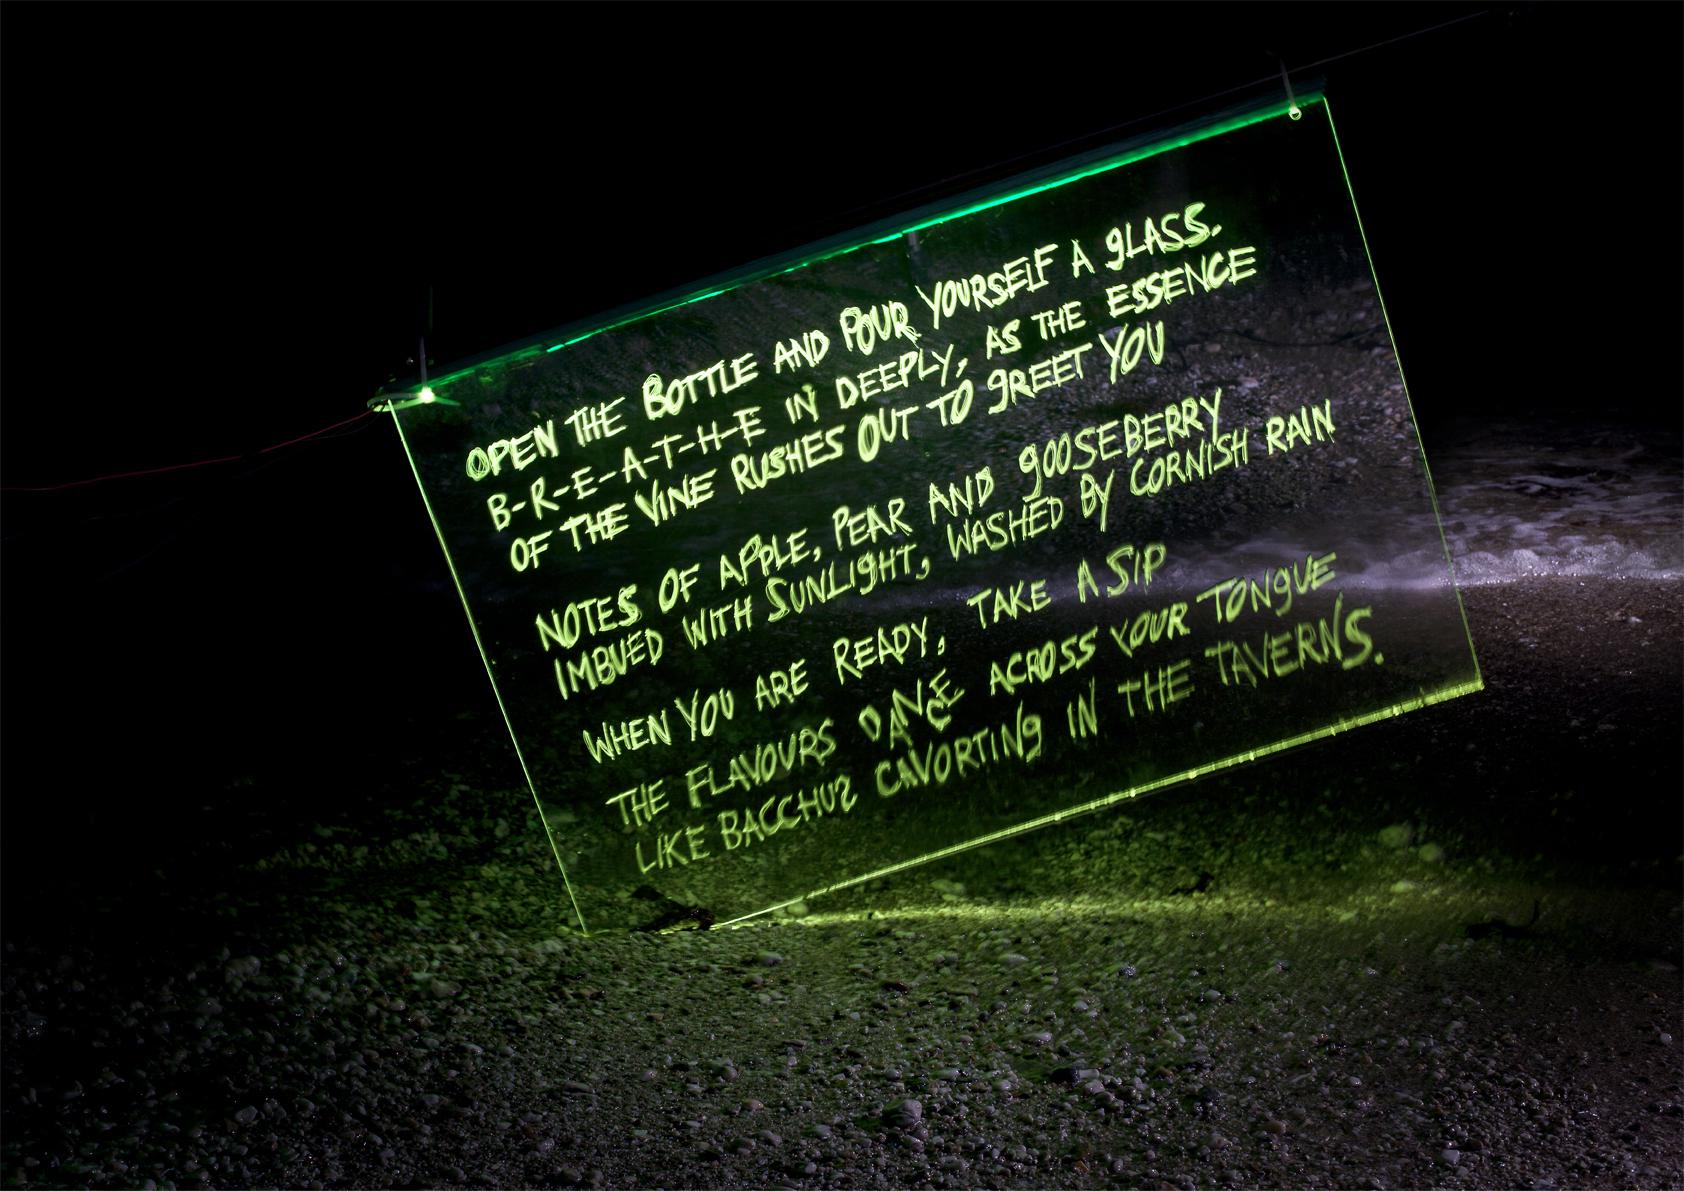 eleanor-bell-light-artist-26-flavours-of-cornwall-wine-poem.jpg